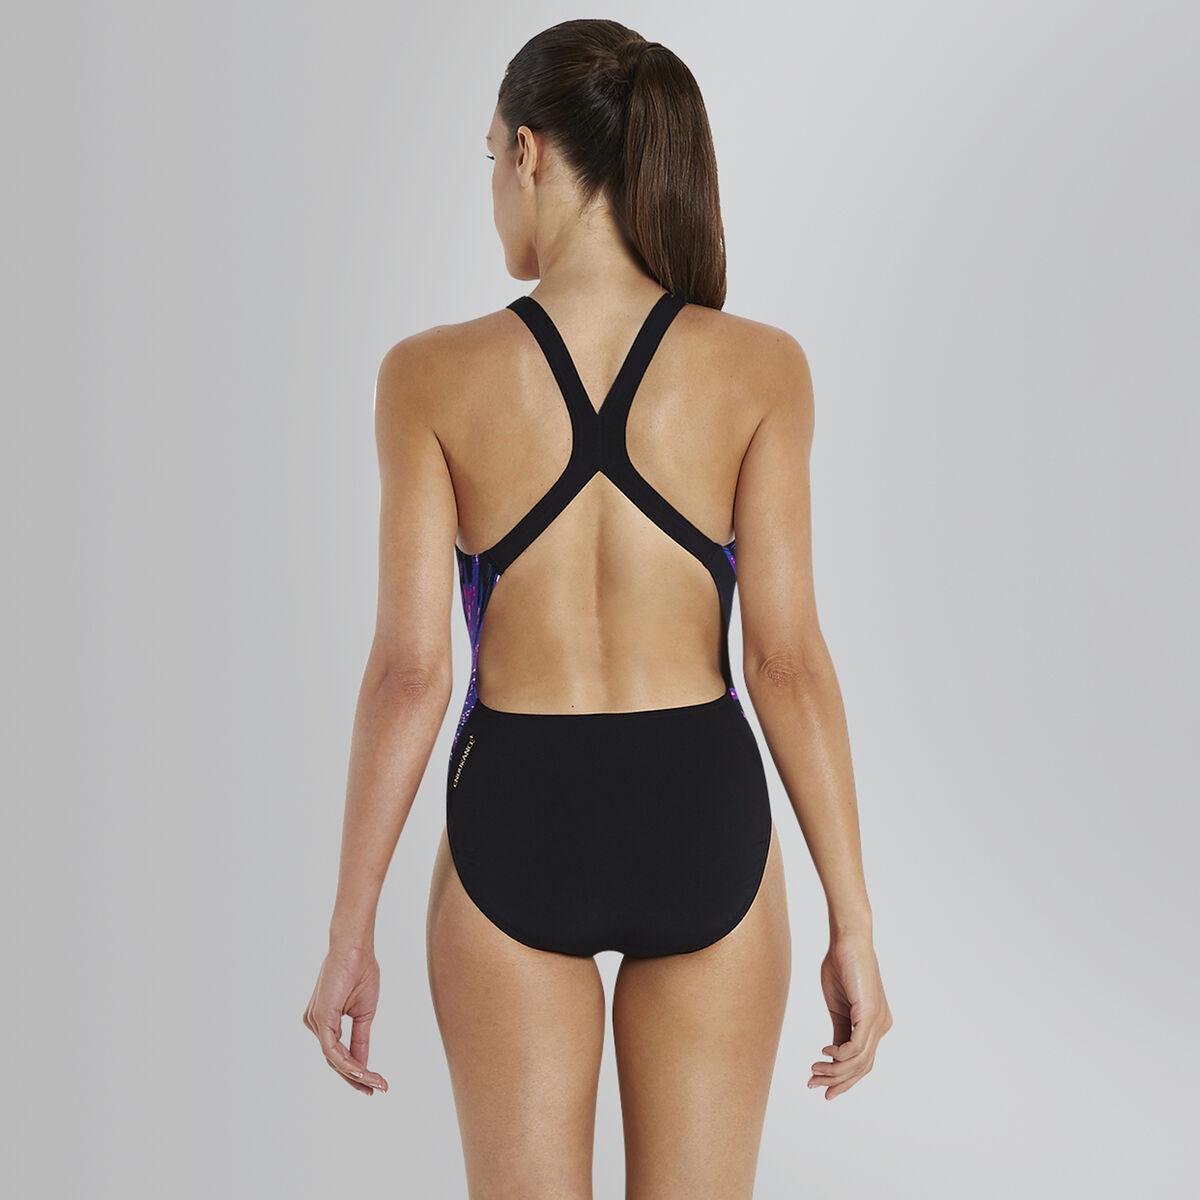 Citrusburst Powerback Swimsuit